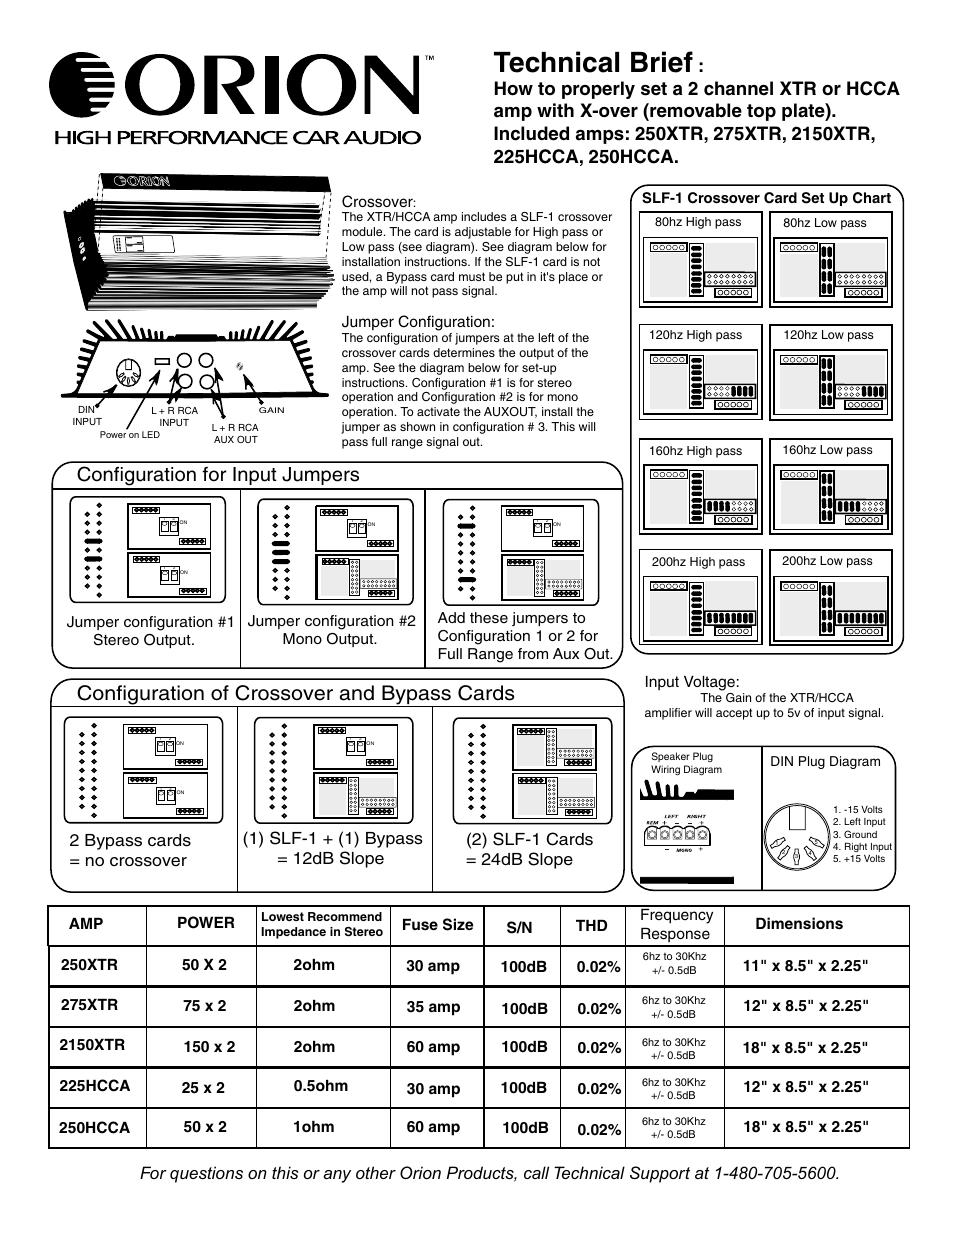 medium resolution of orion 225 hcca wiring diagram 29 wiring diagram images old school car audio